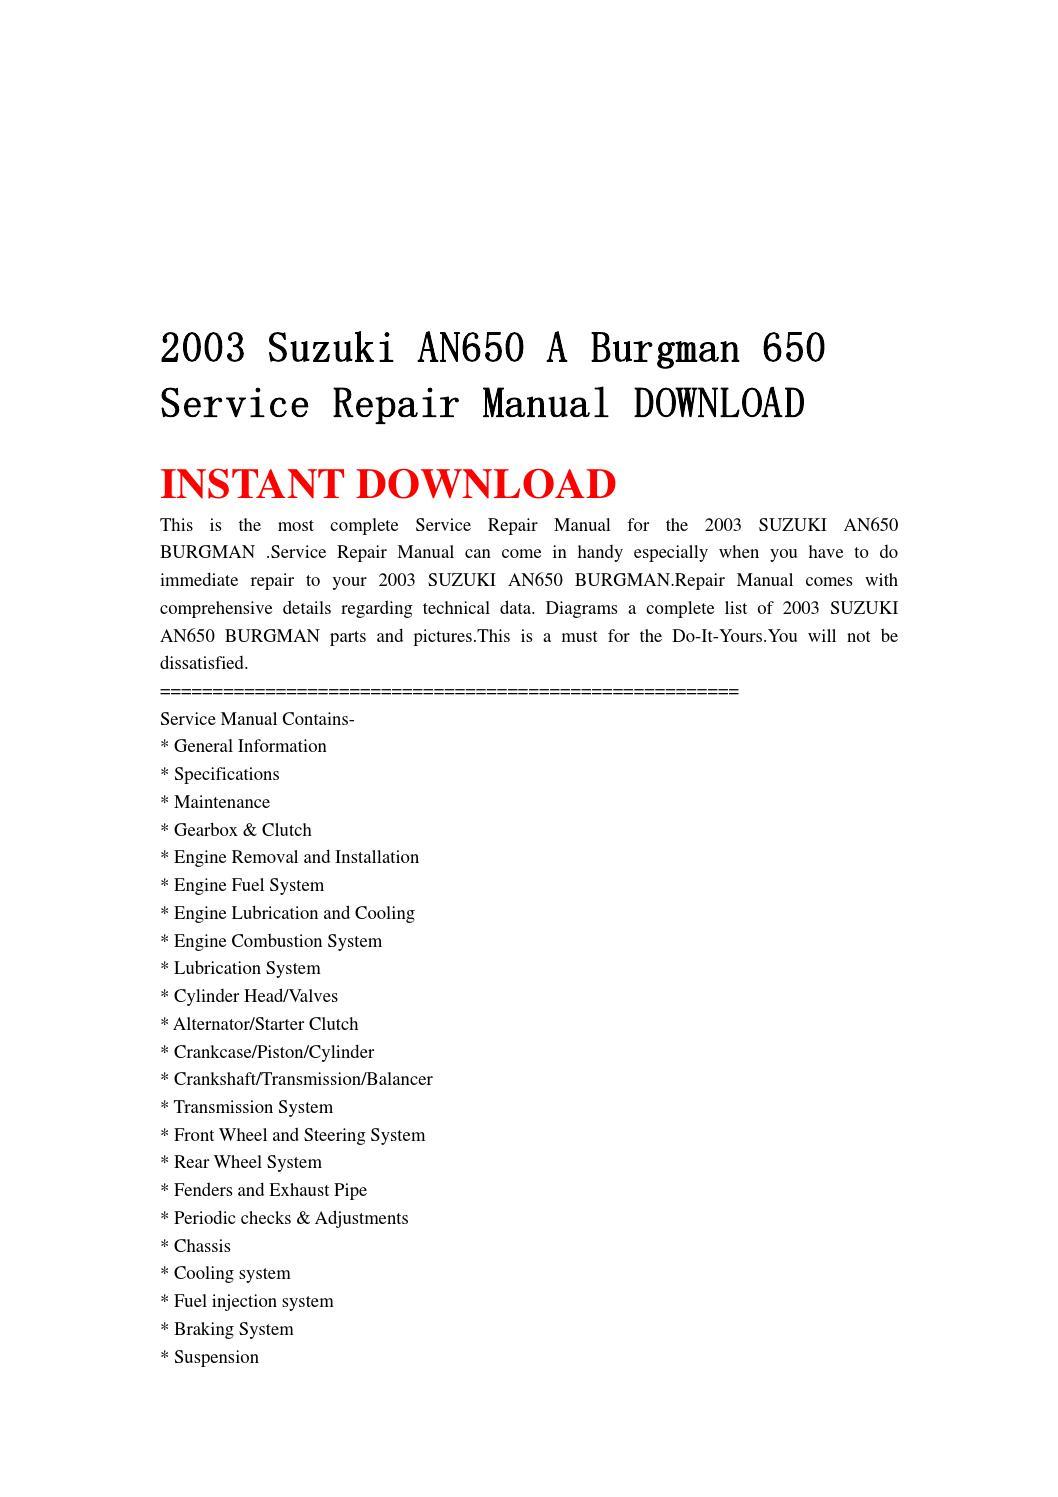 hight resolution of 2003 suzuki an650 a burgman 650 service repair manual download by ksjefkmsef87 issuu